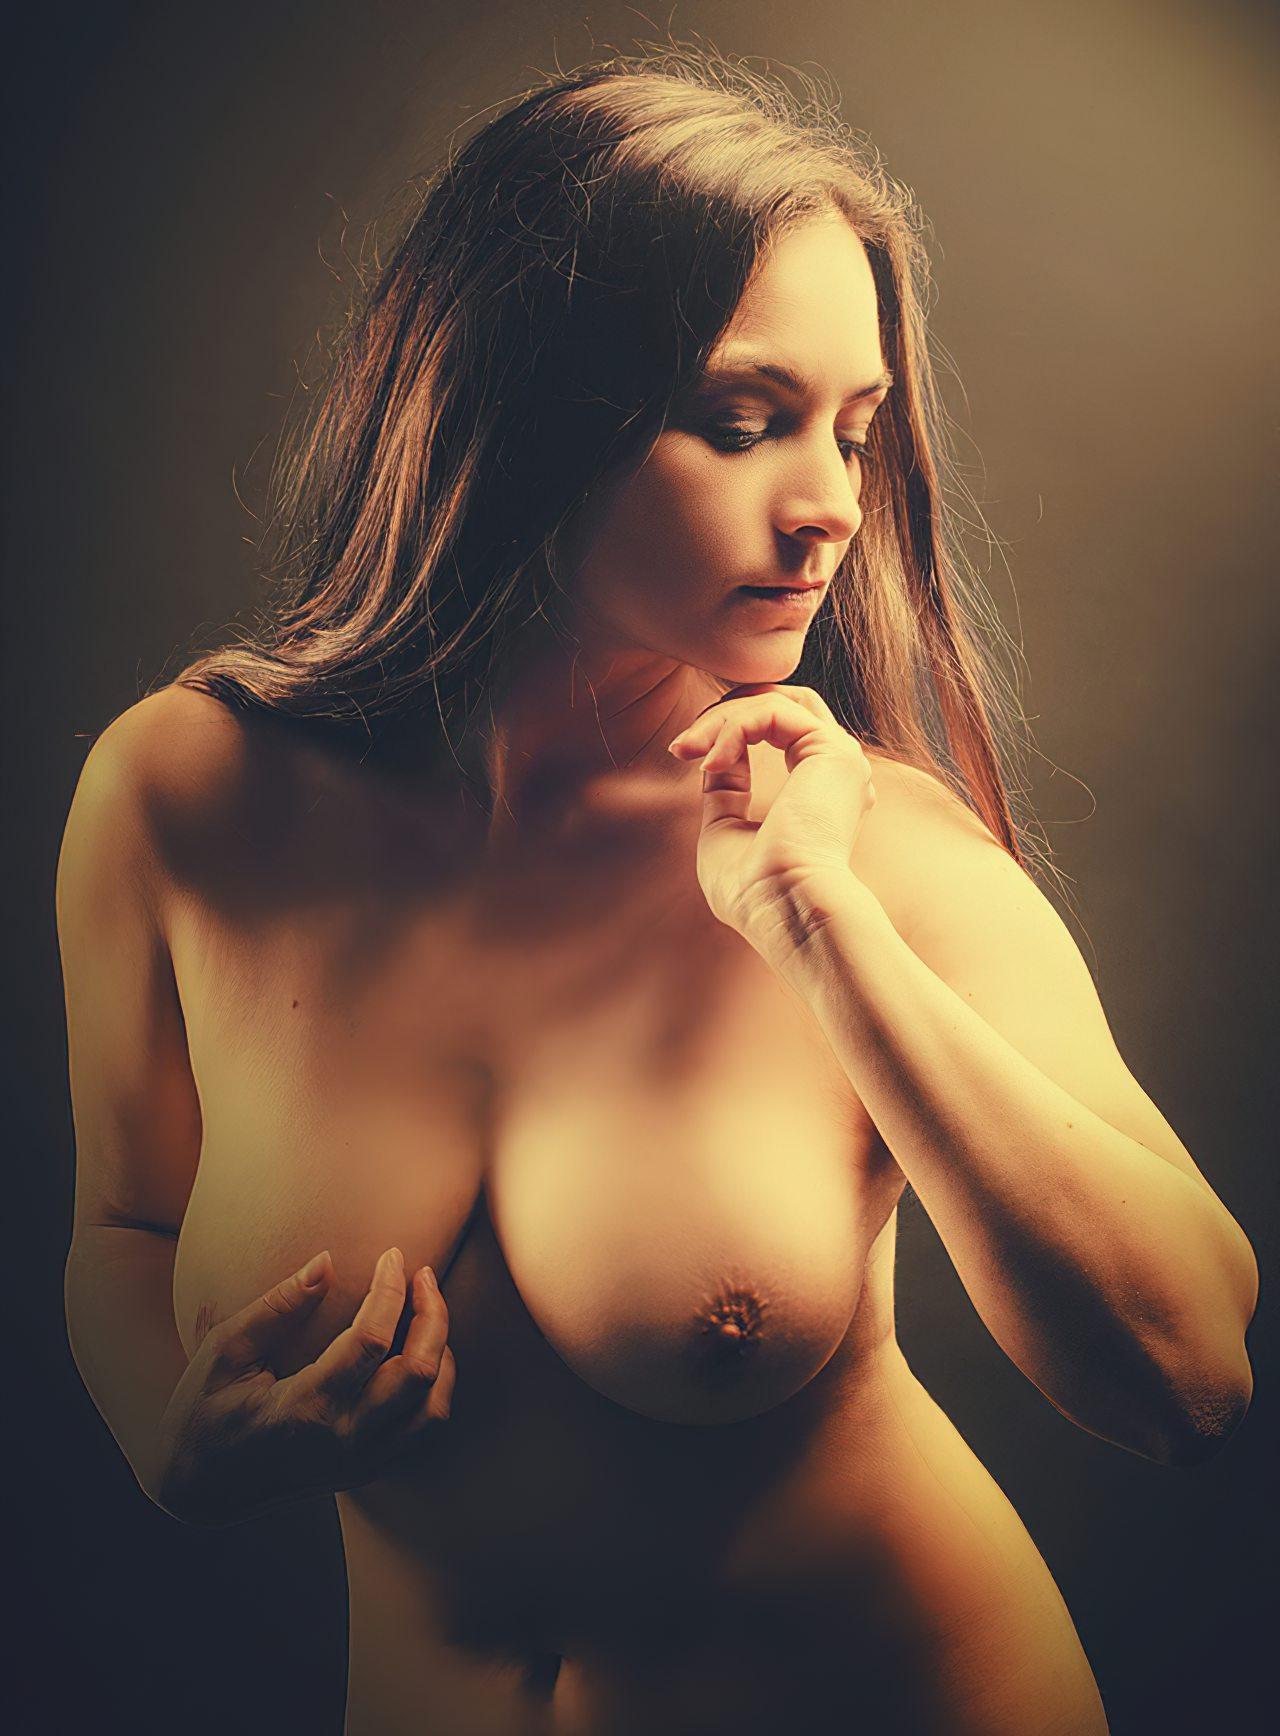 Mulheres Despidas Fotos (17)